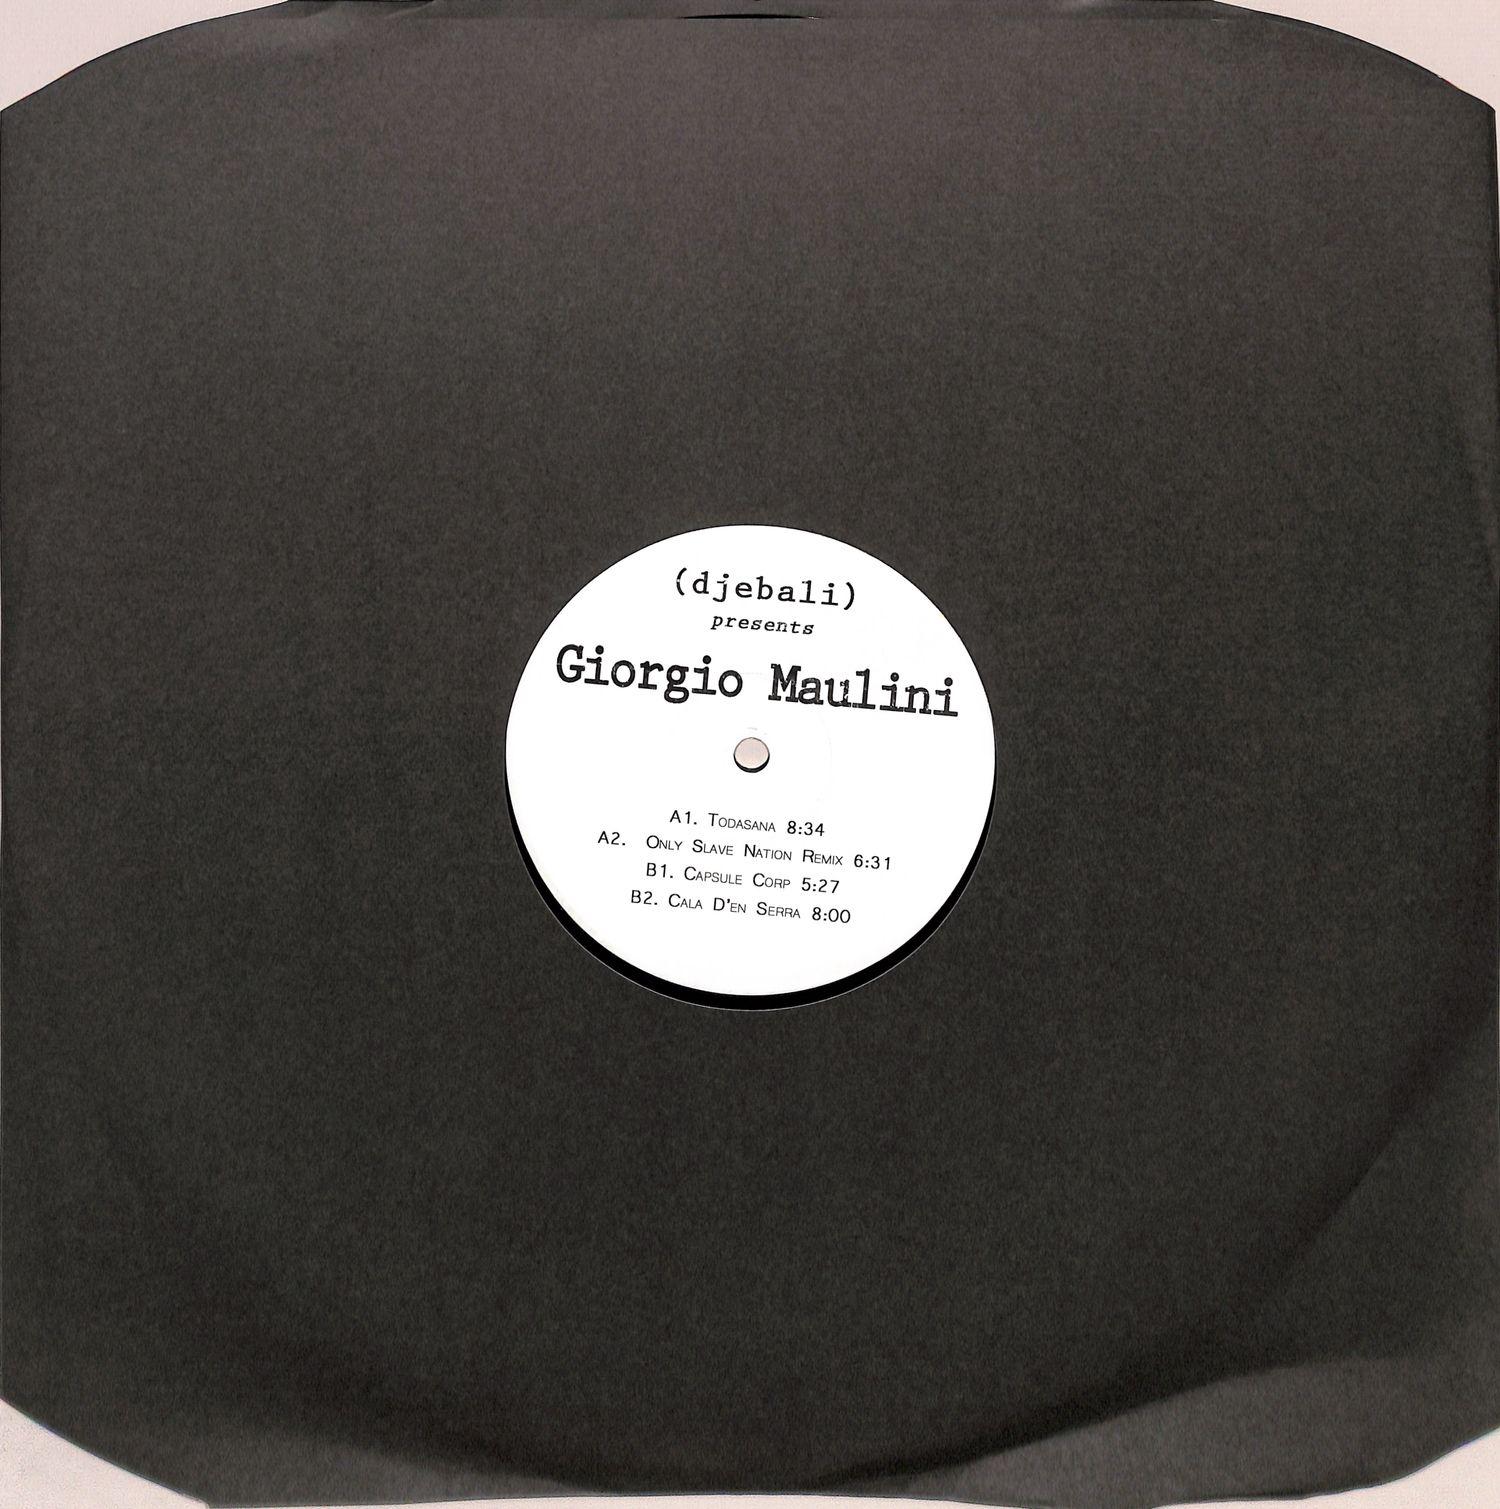 Giorgio Maulini - EP ONLY SLAVE NATION RMX